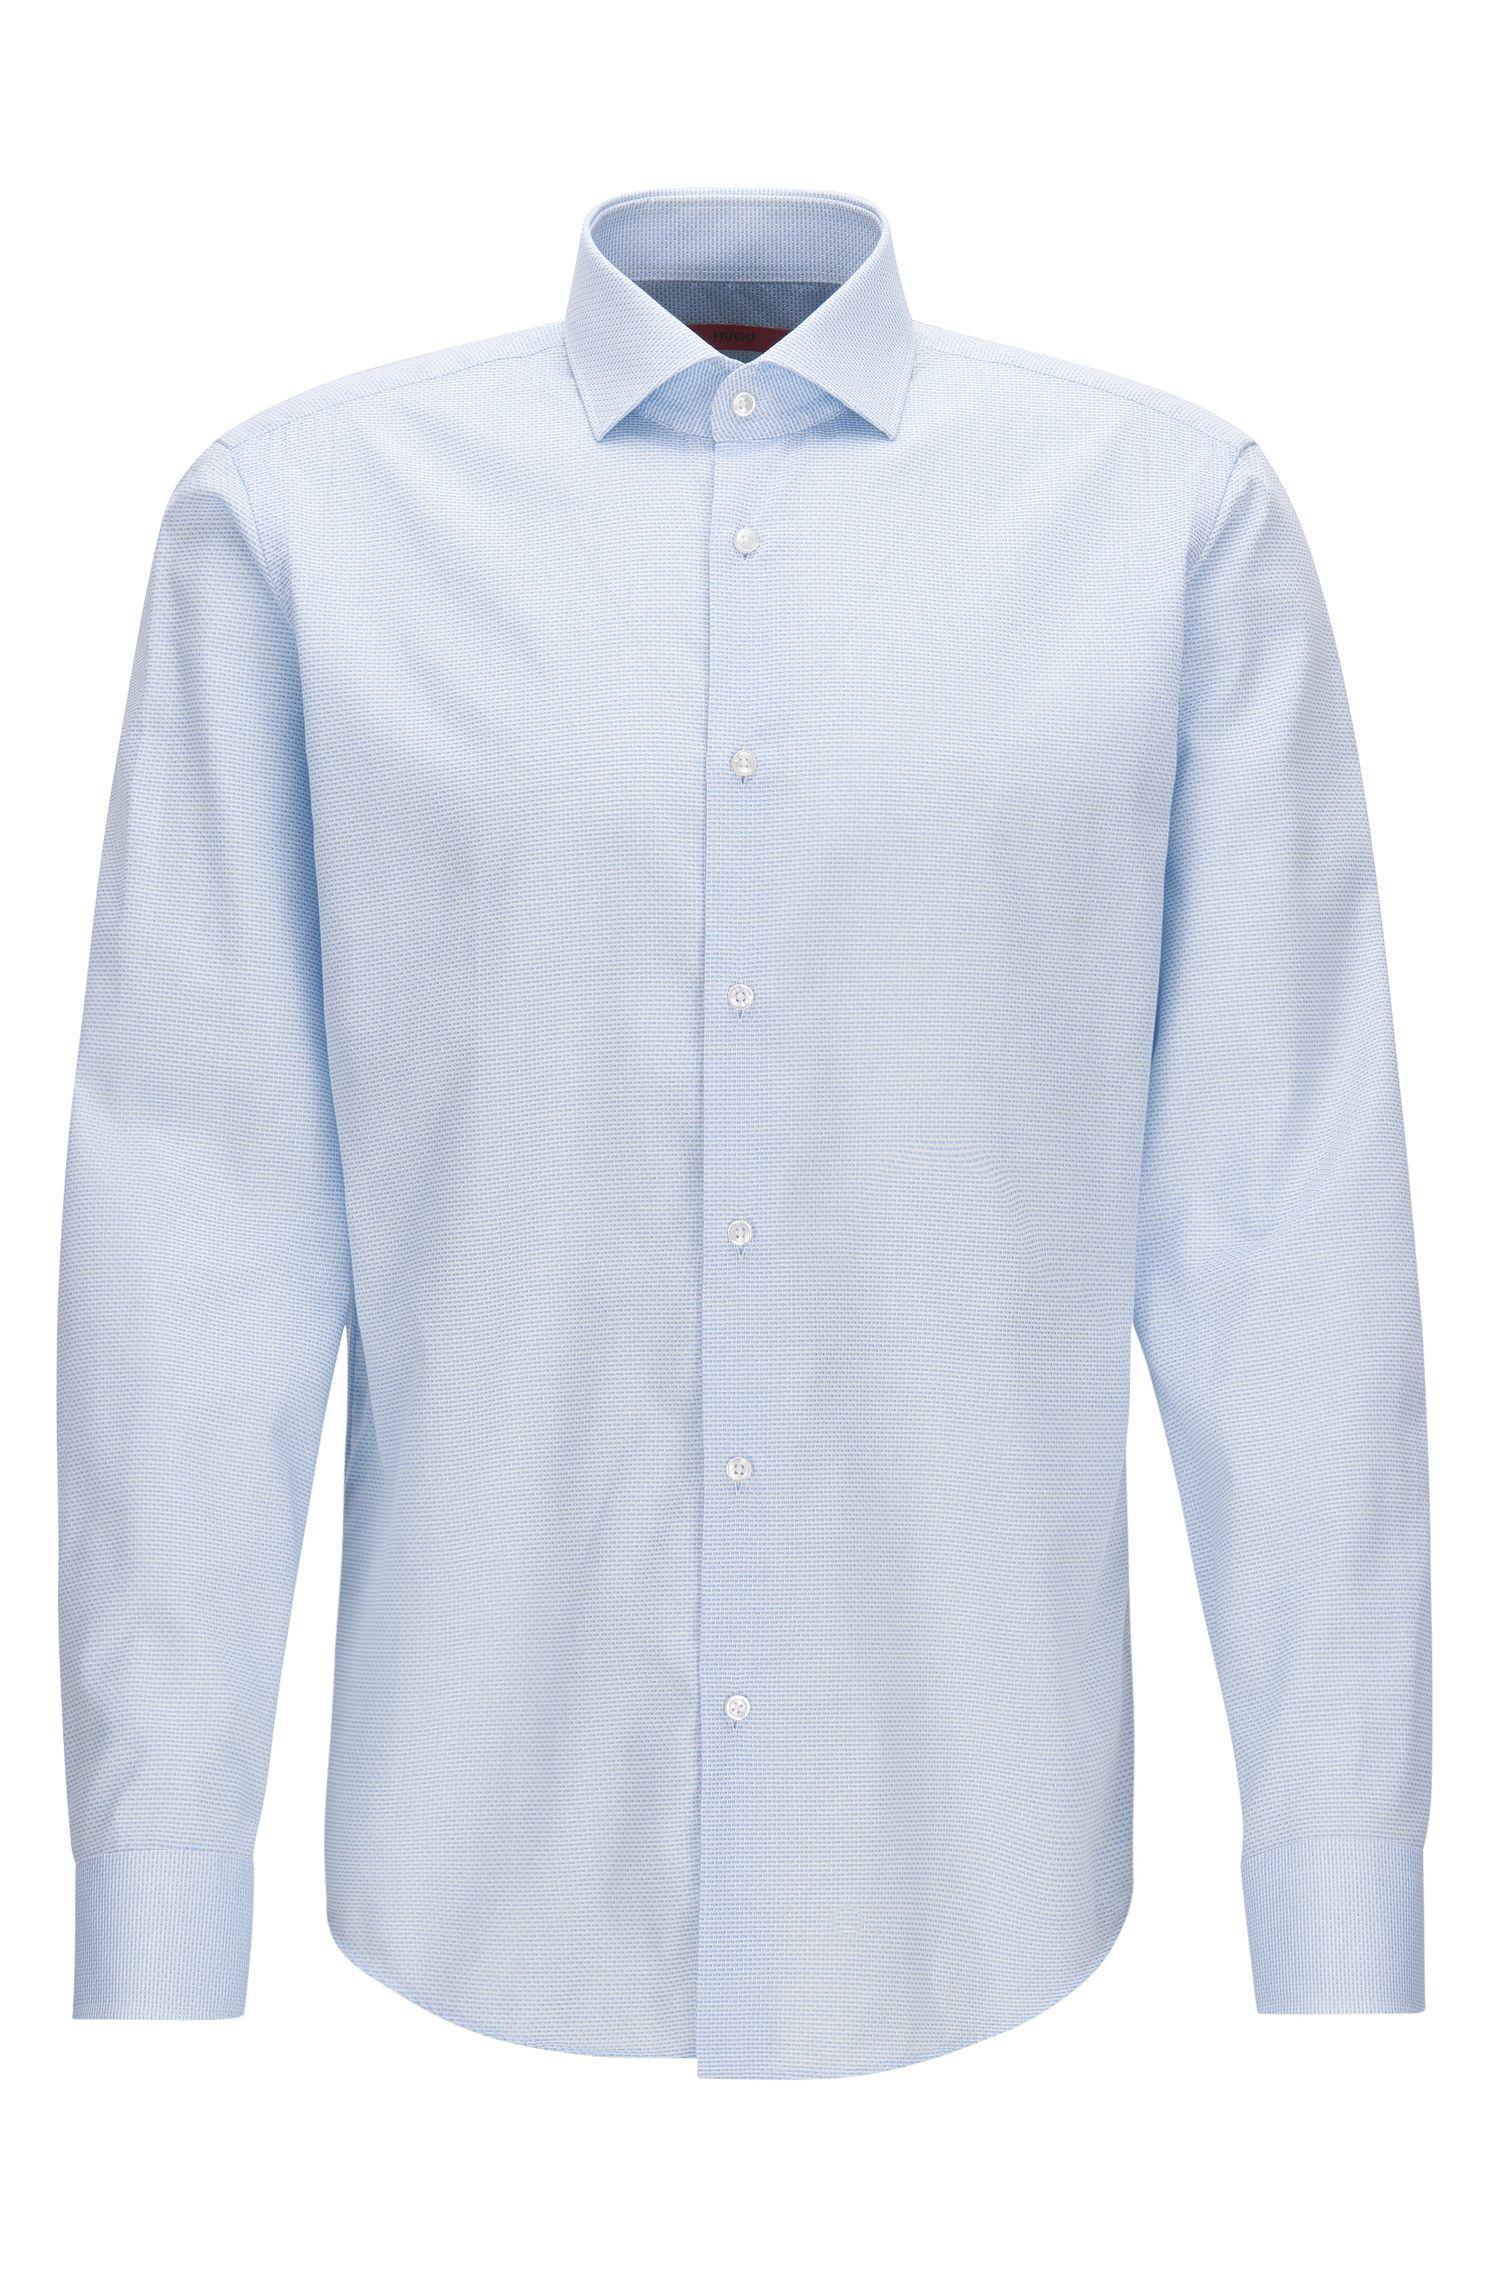 Gemustertes Regular-Fit Hemd aus Baumwoll-Popeline